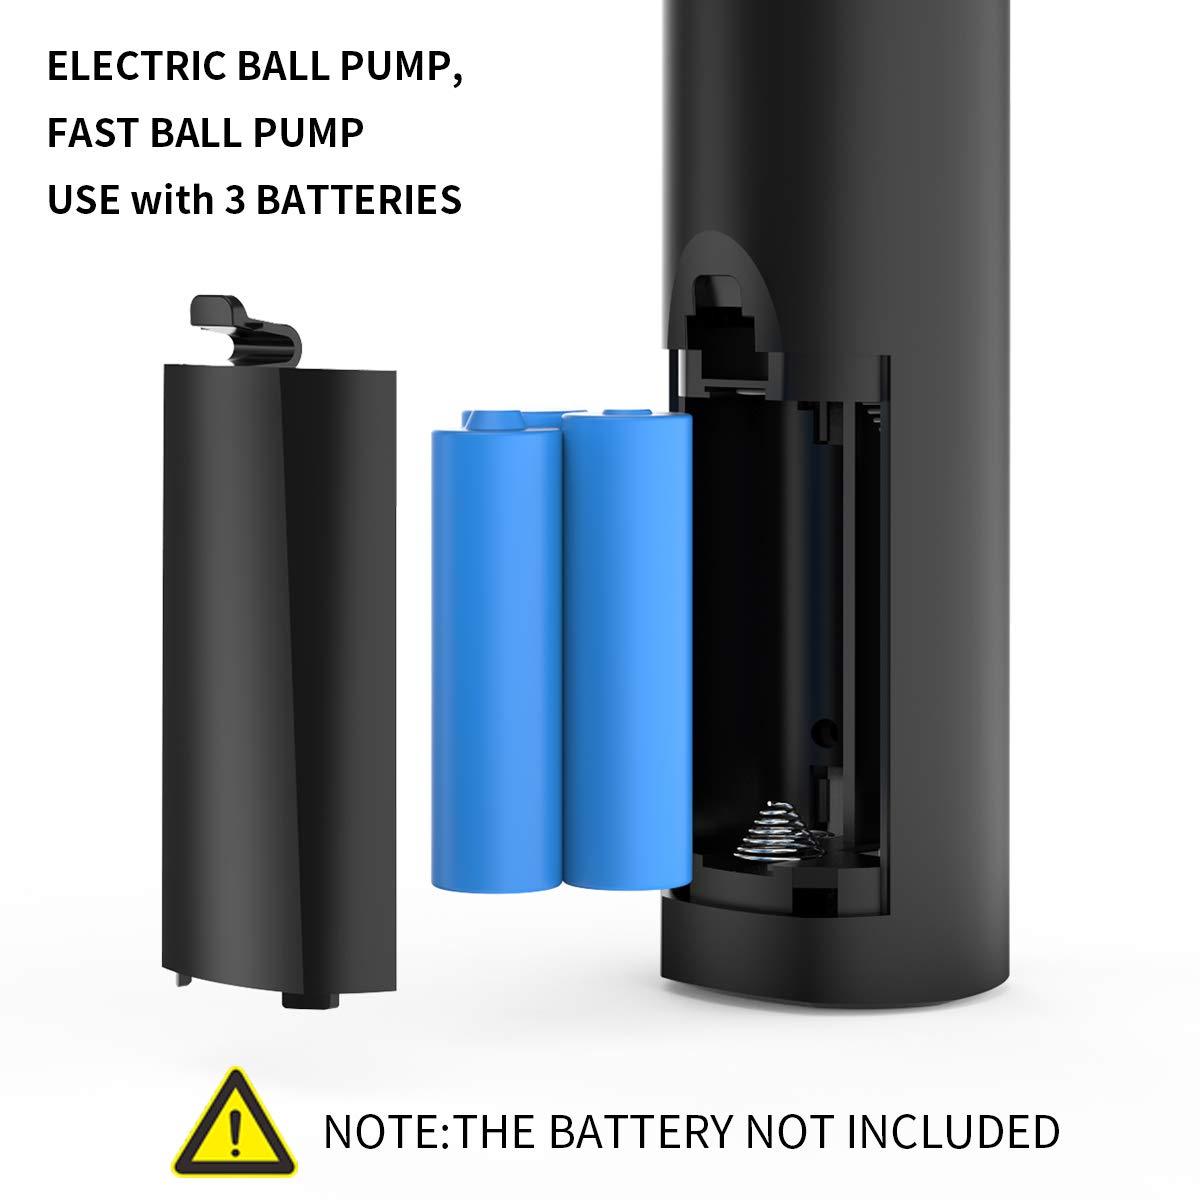 morpilot Ballpumpe|Tragbare Elektrische Luftpumpe Mini Automatische Handpumpe|Ball Pumpe mit Luftschlauch| 2 Nadeln für Fußball Basketball Ballon Volleyball Handball